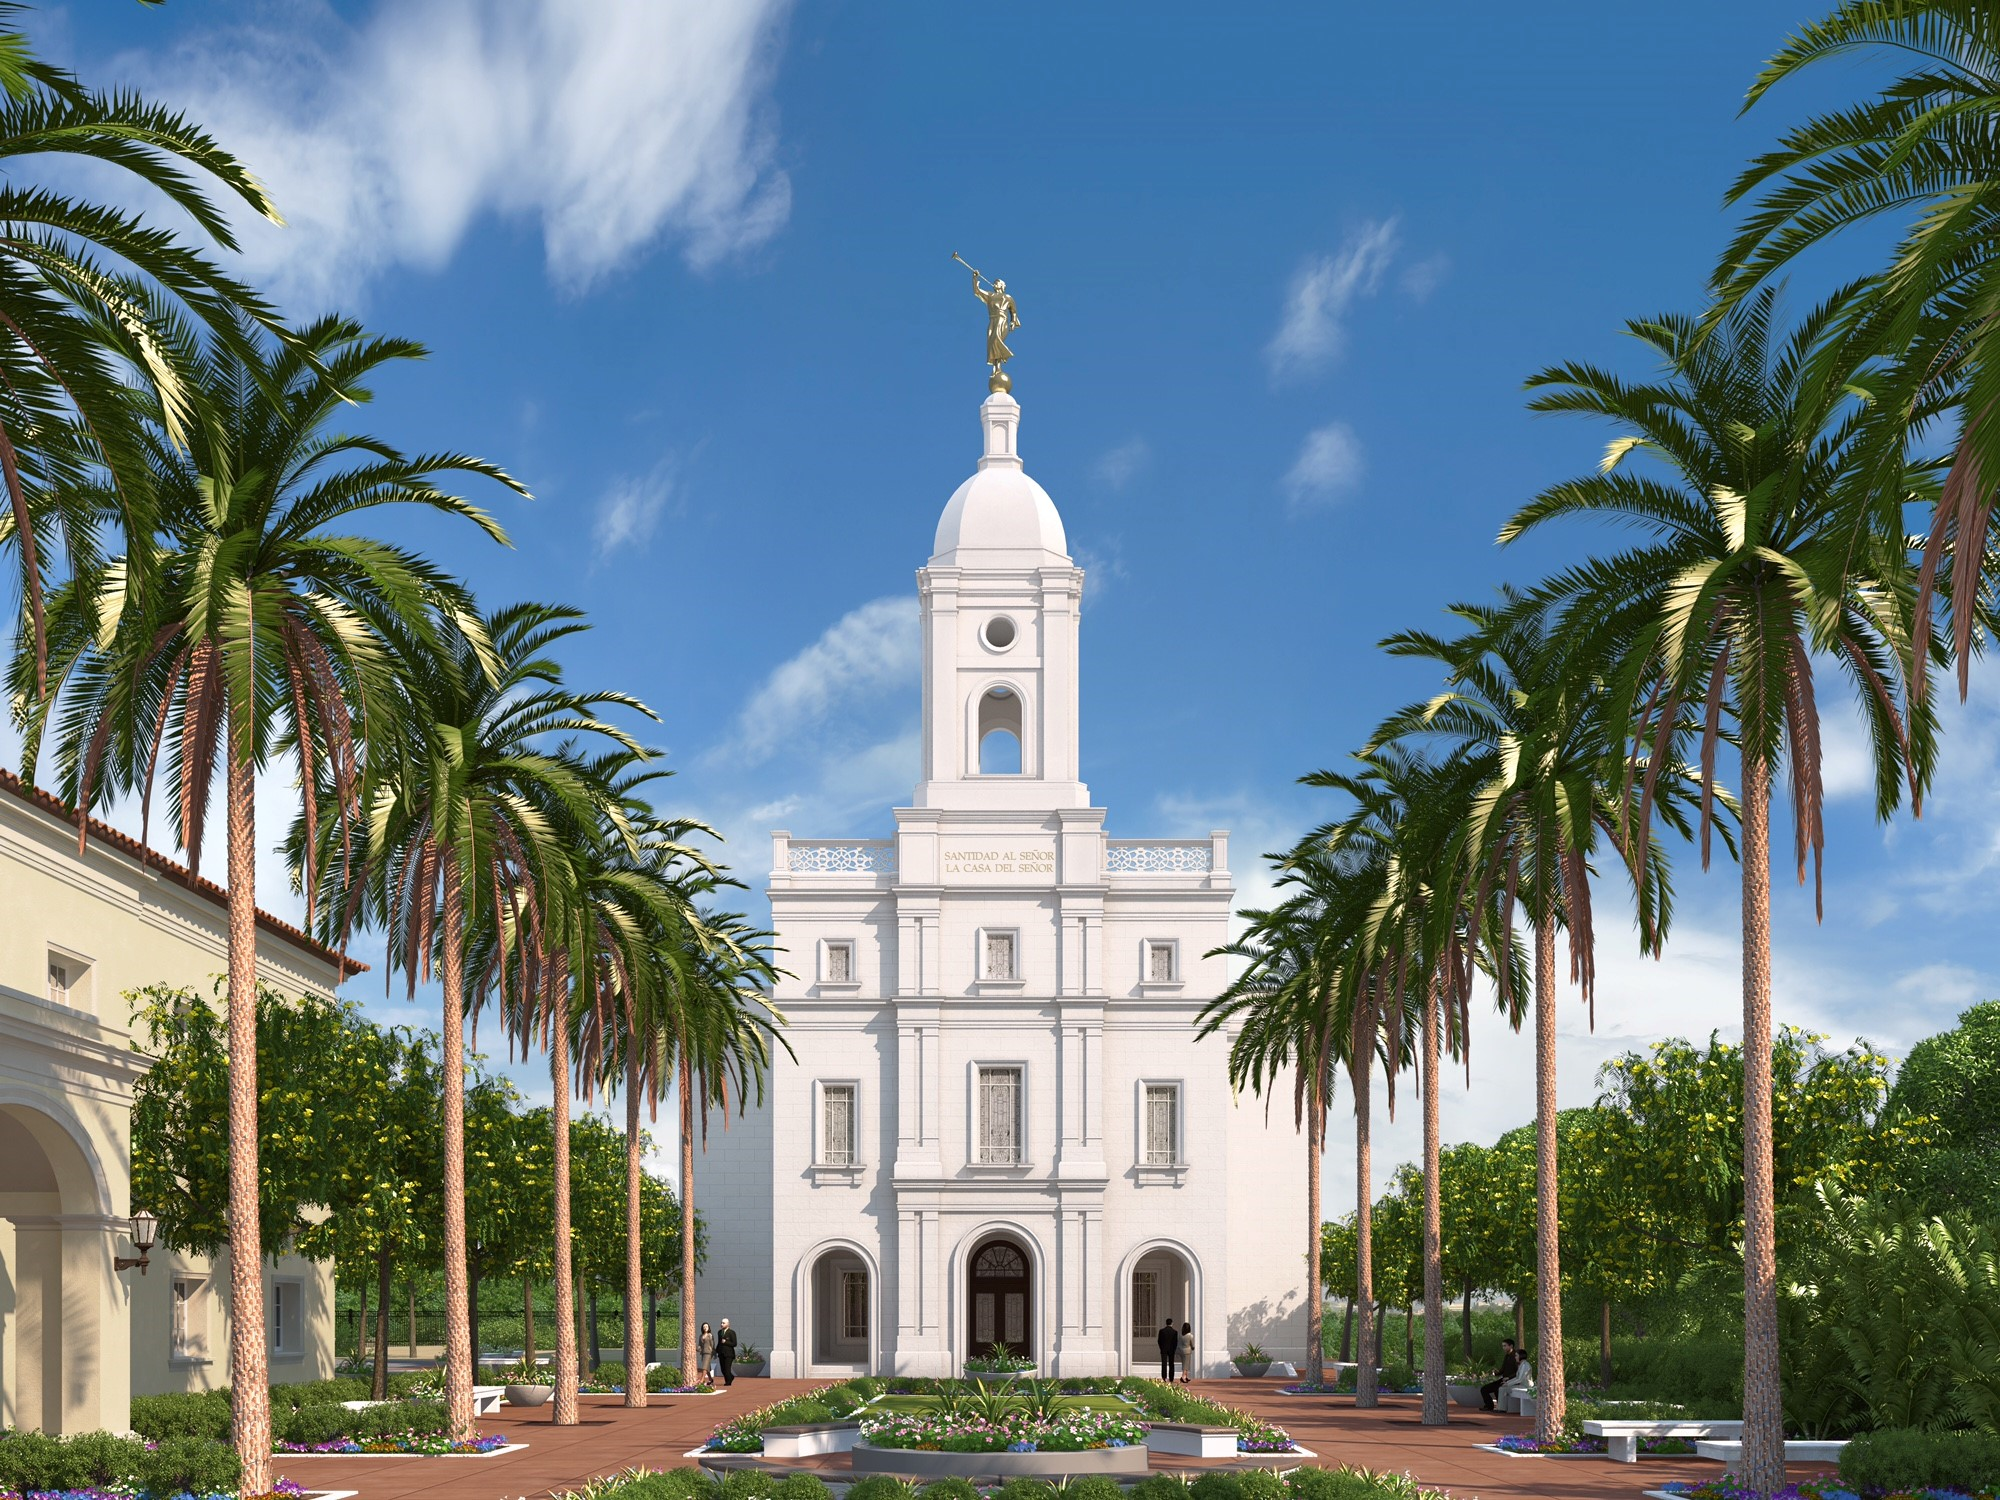 templo de barranquilla